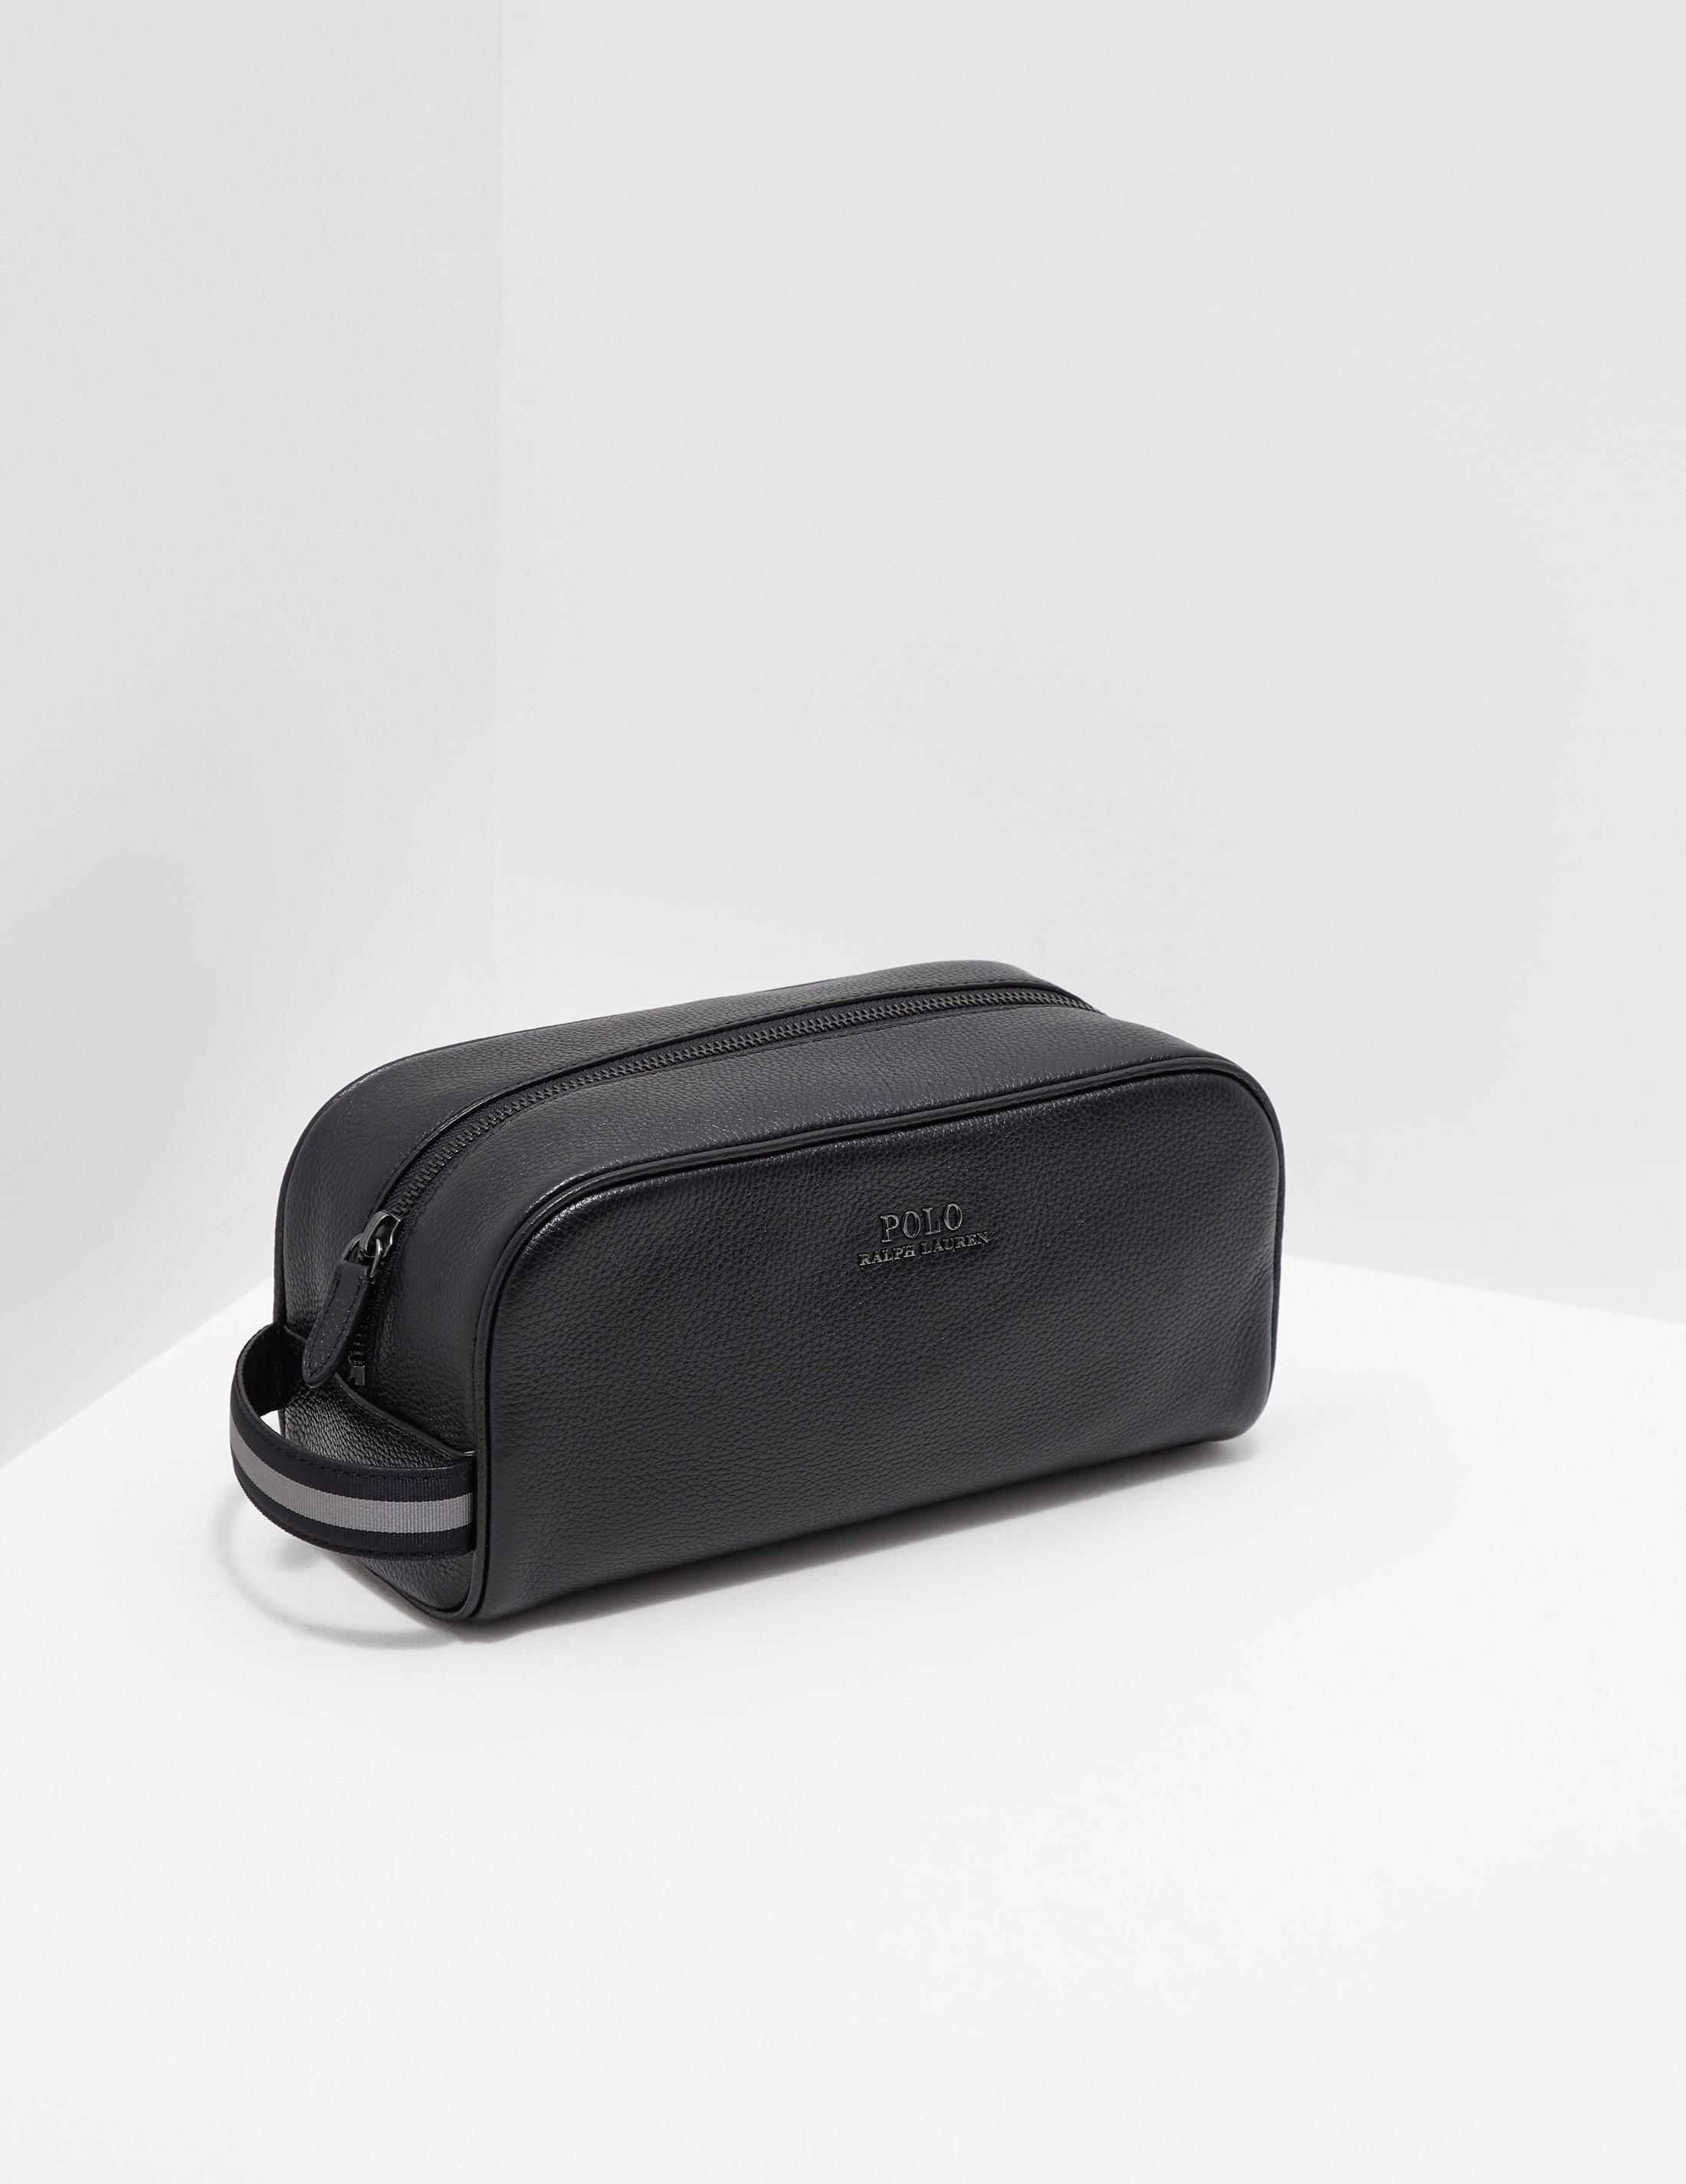 Polo Ralph Lauren Mens Wash Bag - Online Exclusive Black in Black ... cf443fbc65